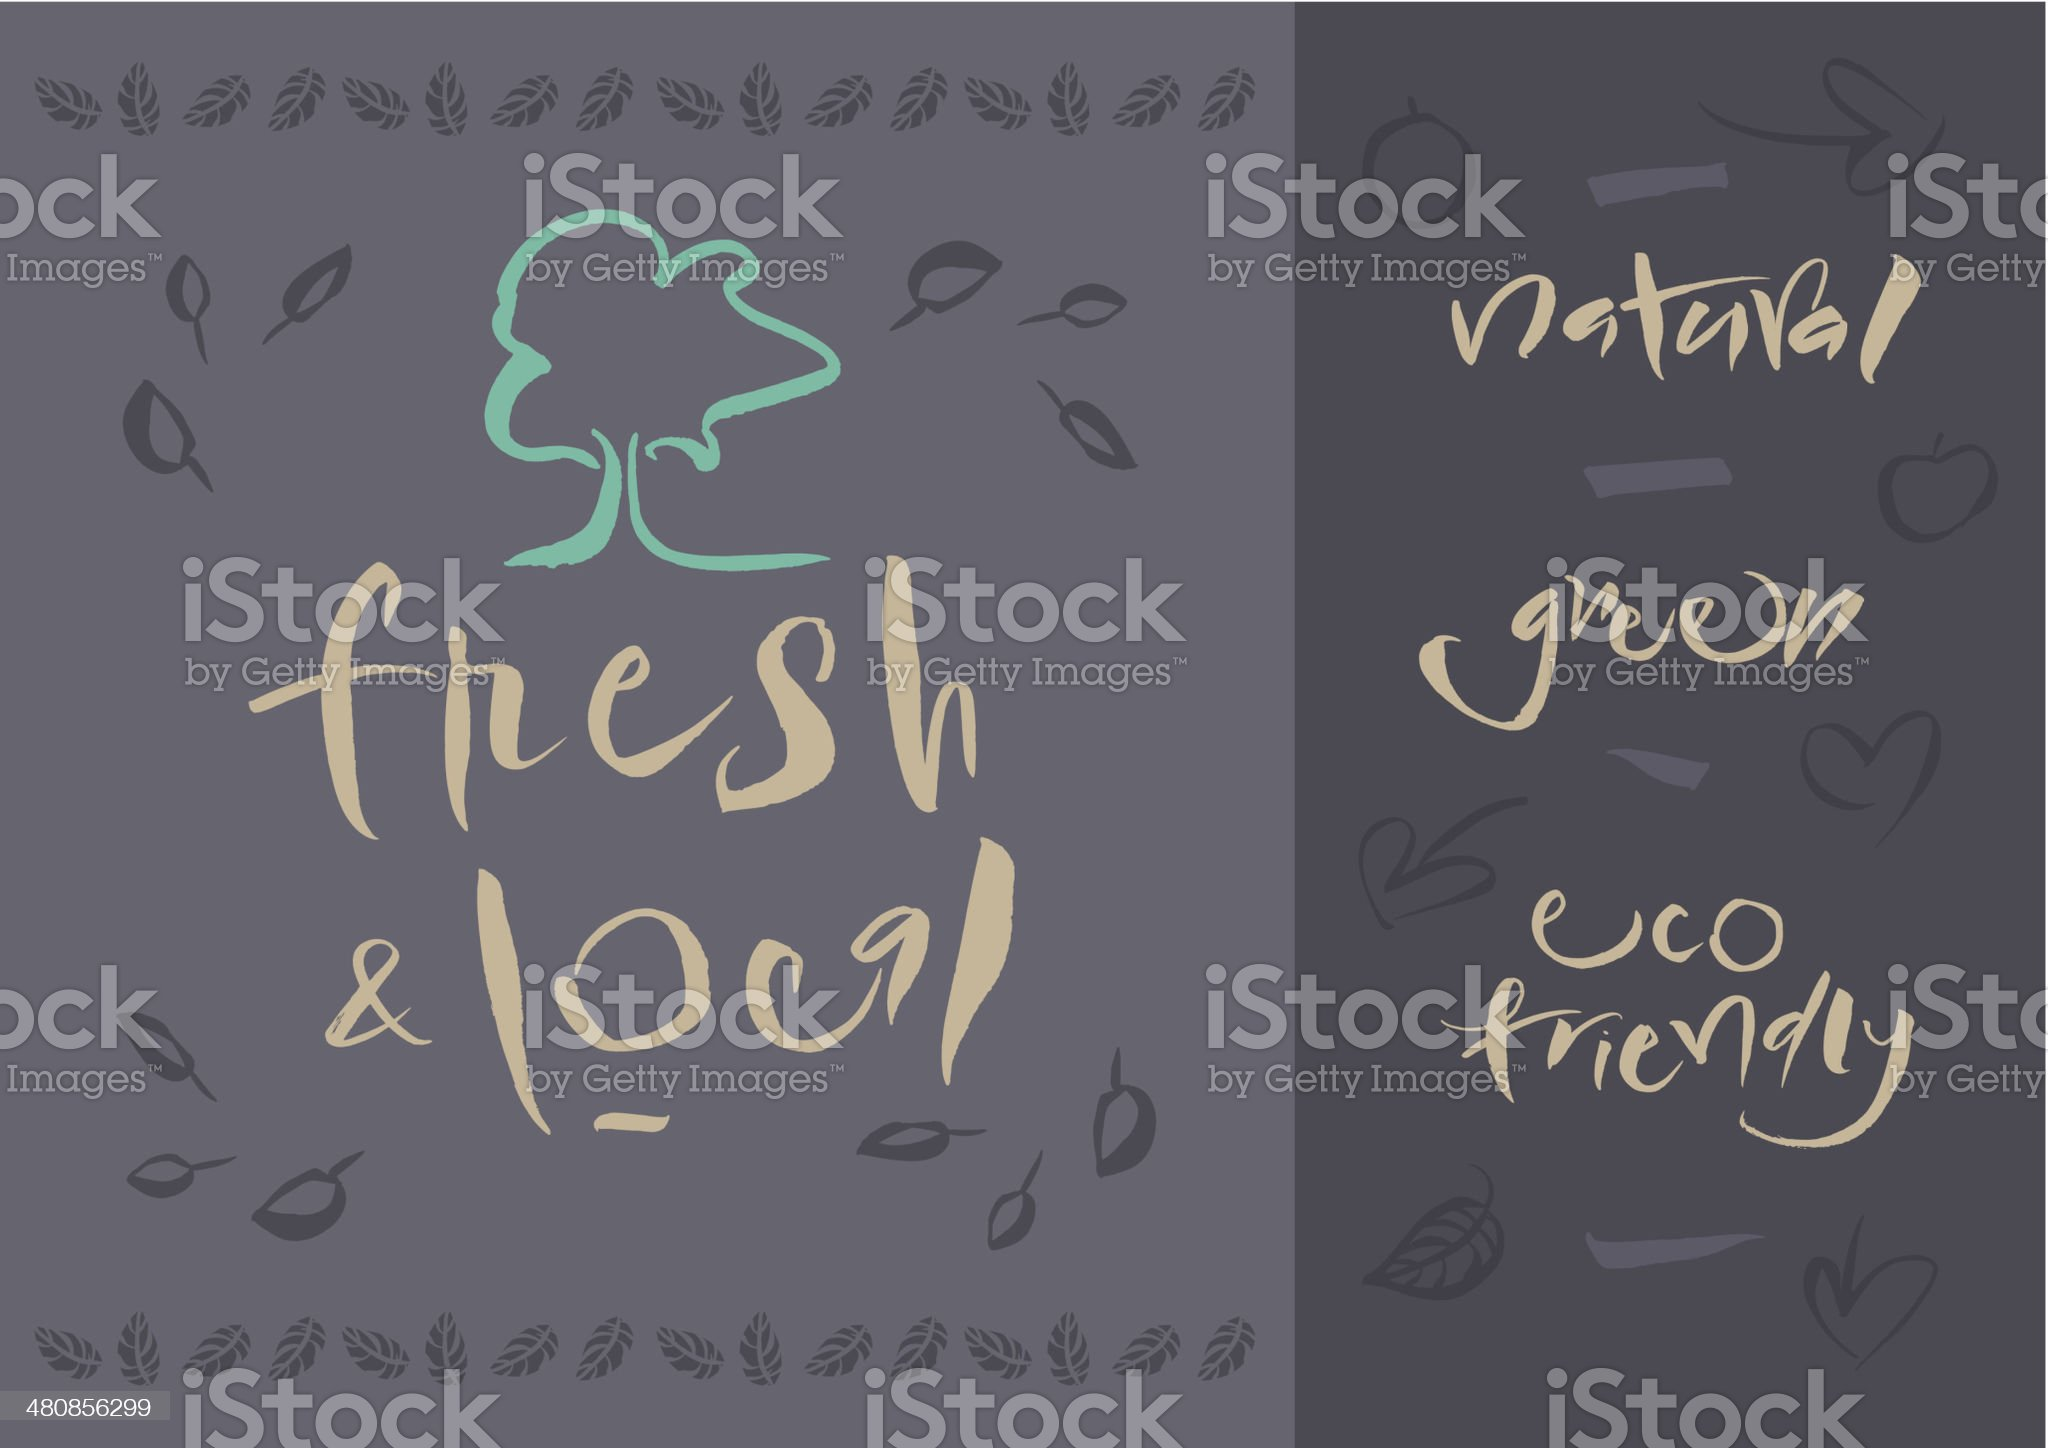 Vegetarian - Fresh & Local - Calligraphy royalty-free stock vector art